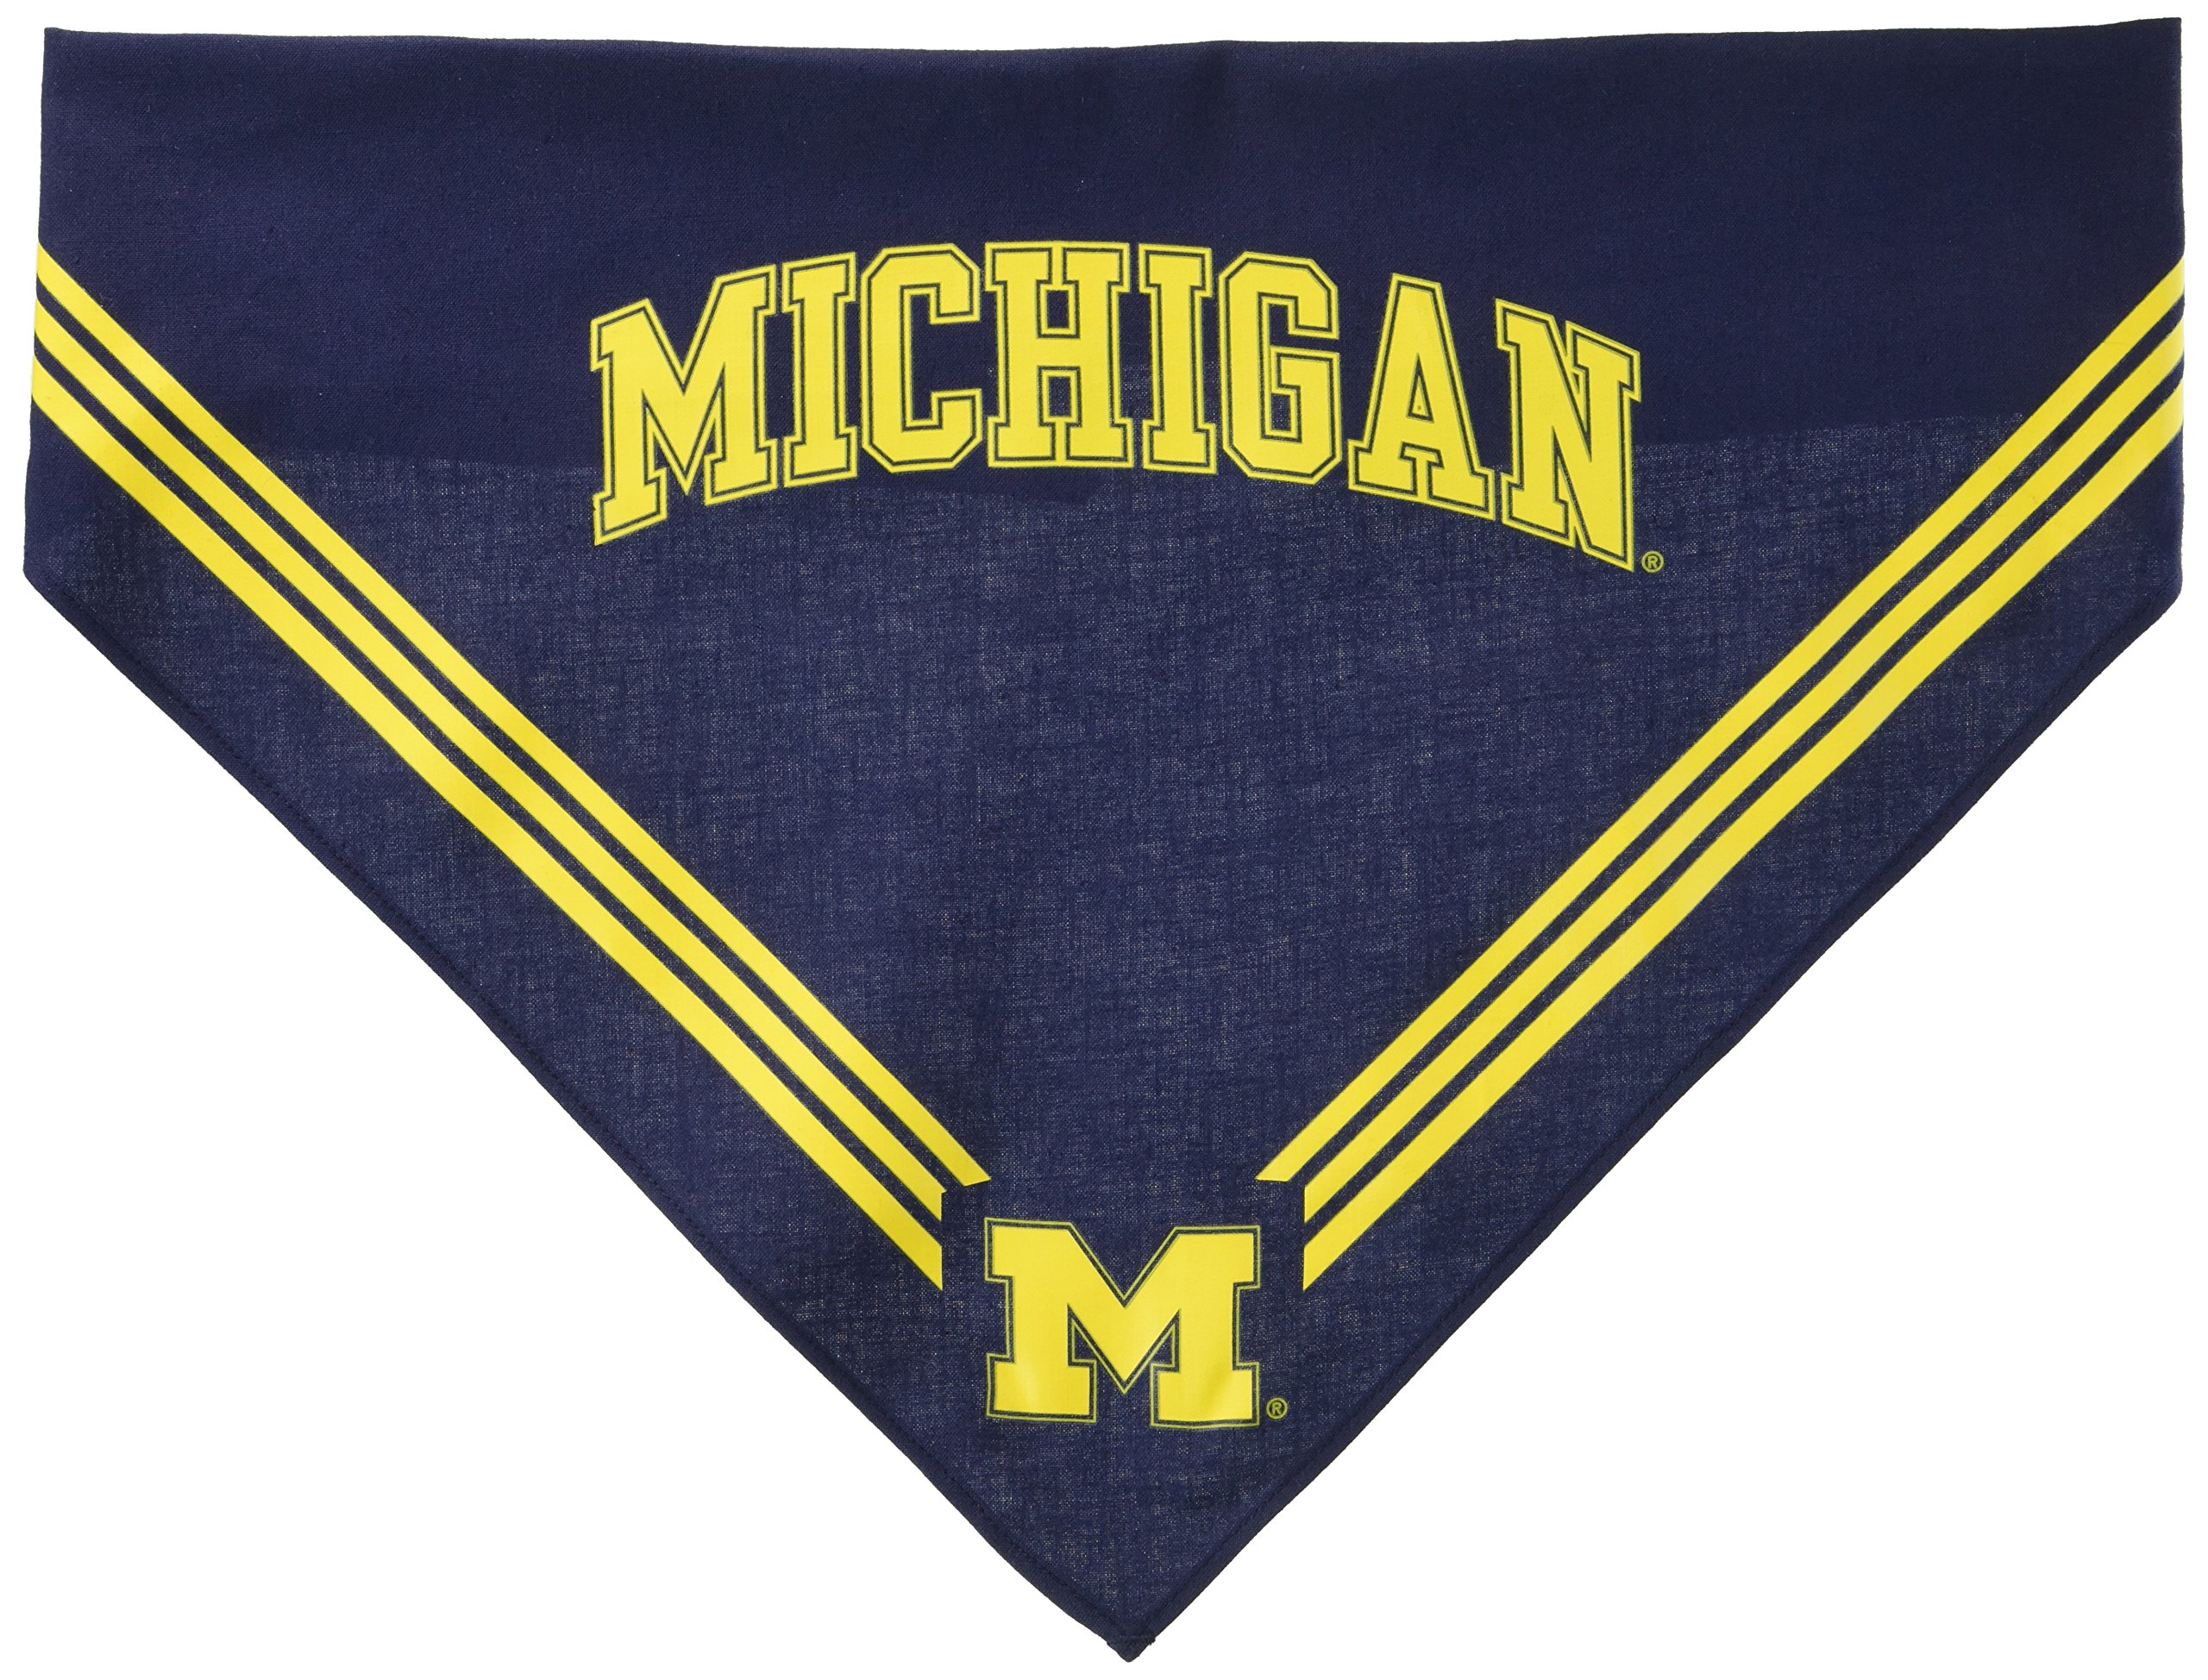 Collegiate Michigan Wolverines Pet Bandana, Medium/Large - Dog Bandana must-have for Birthdays, Parties, Sports Games etc.